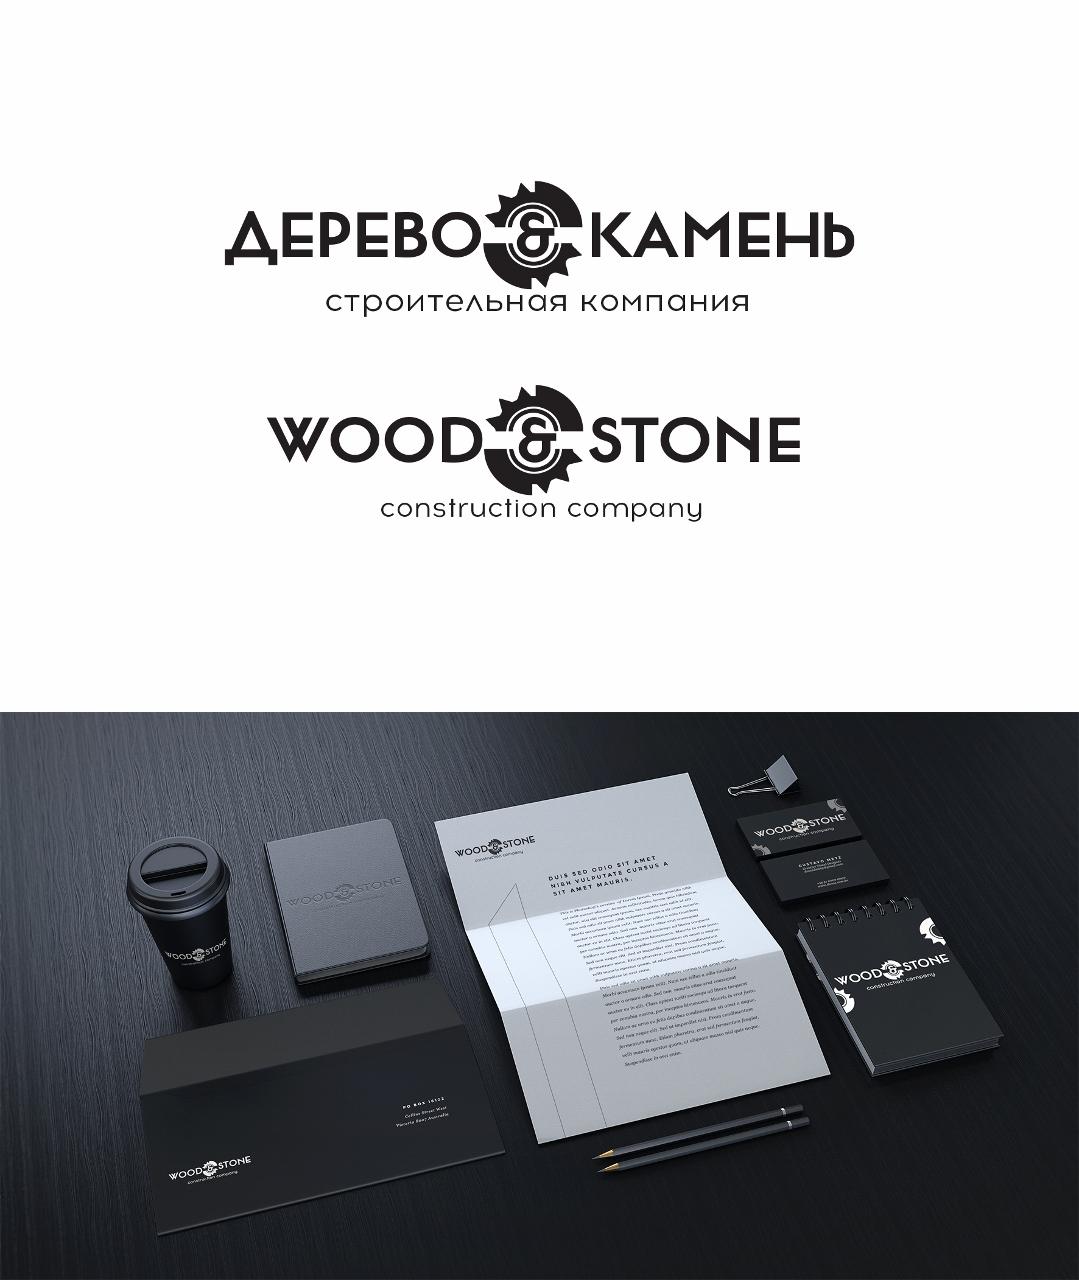 Логотип и Фирменный стиль фото f_79154949fde08cd5.jpg